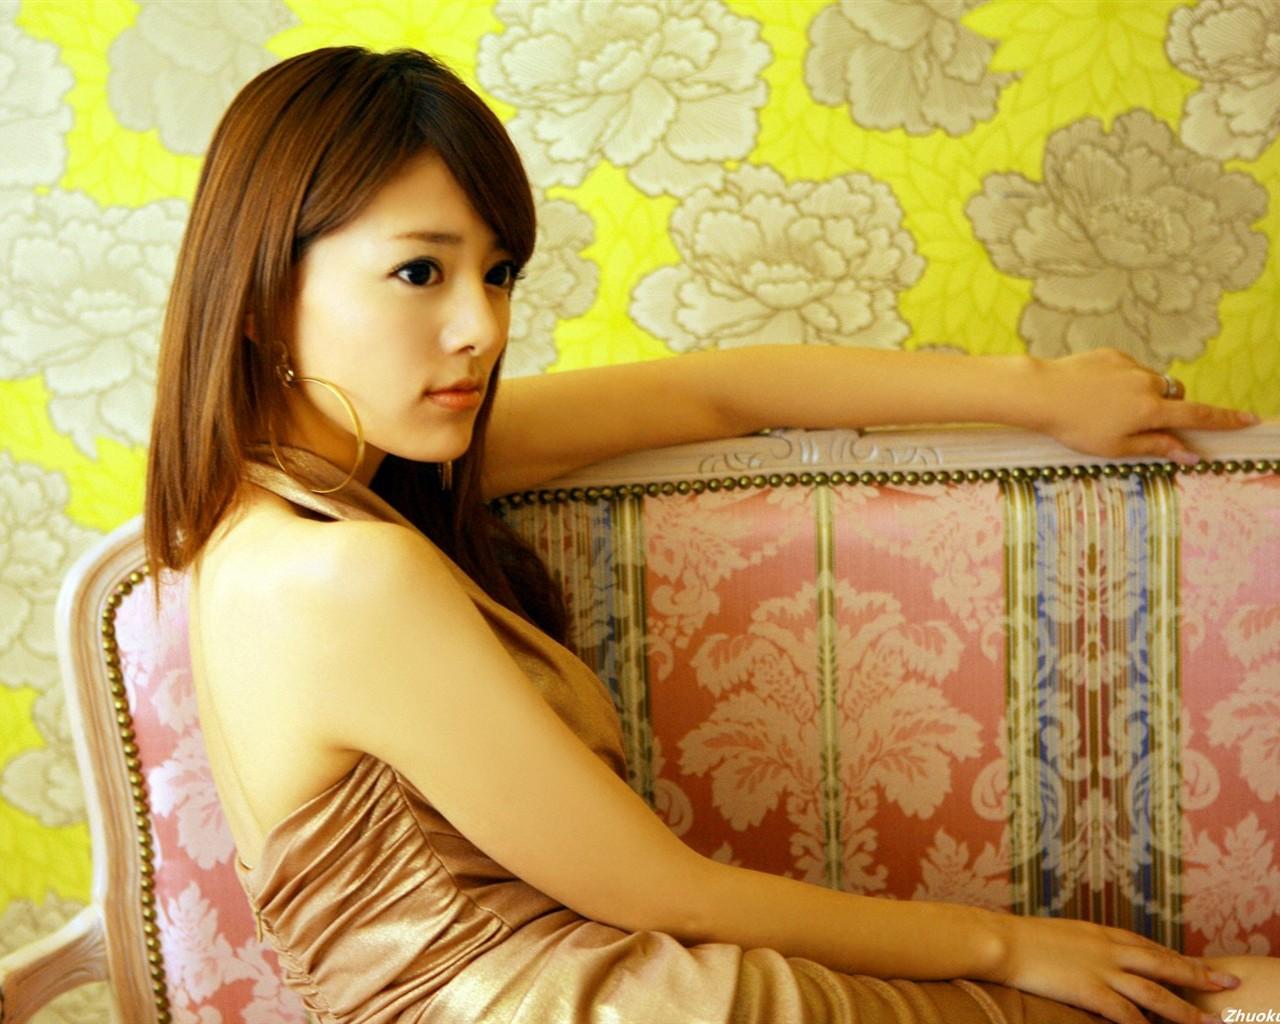 Alan日本性感女星寫真 #7 - 1280x1024 壁紙下載 - Alan日本性感女星寫真 - 人物 壁紙 - V3壁紙站